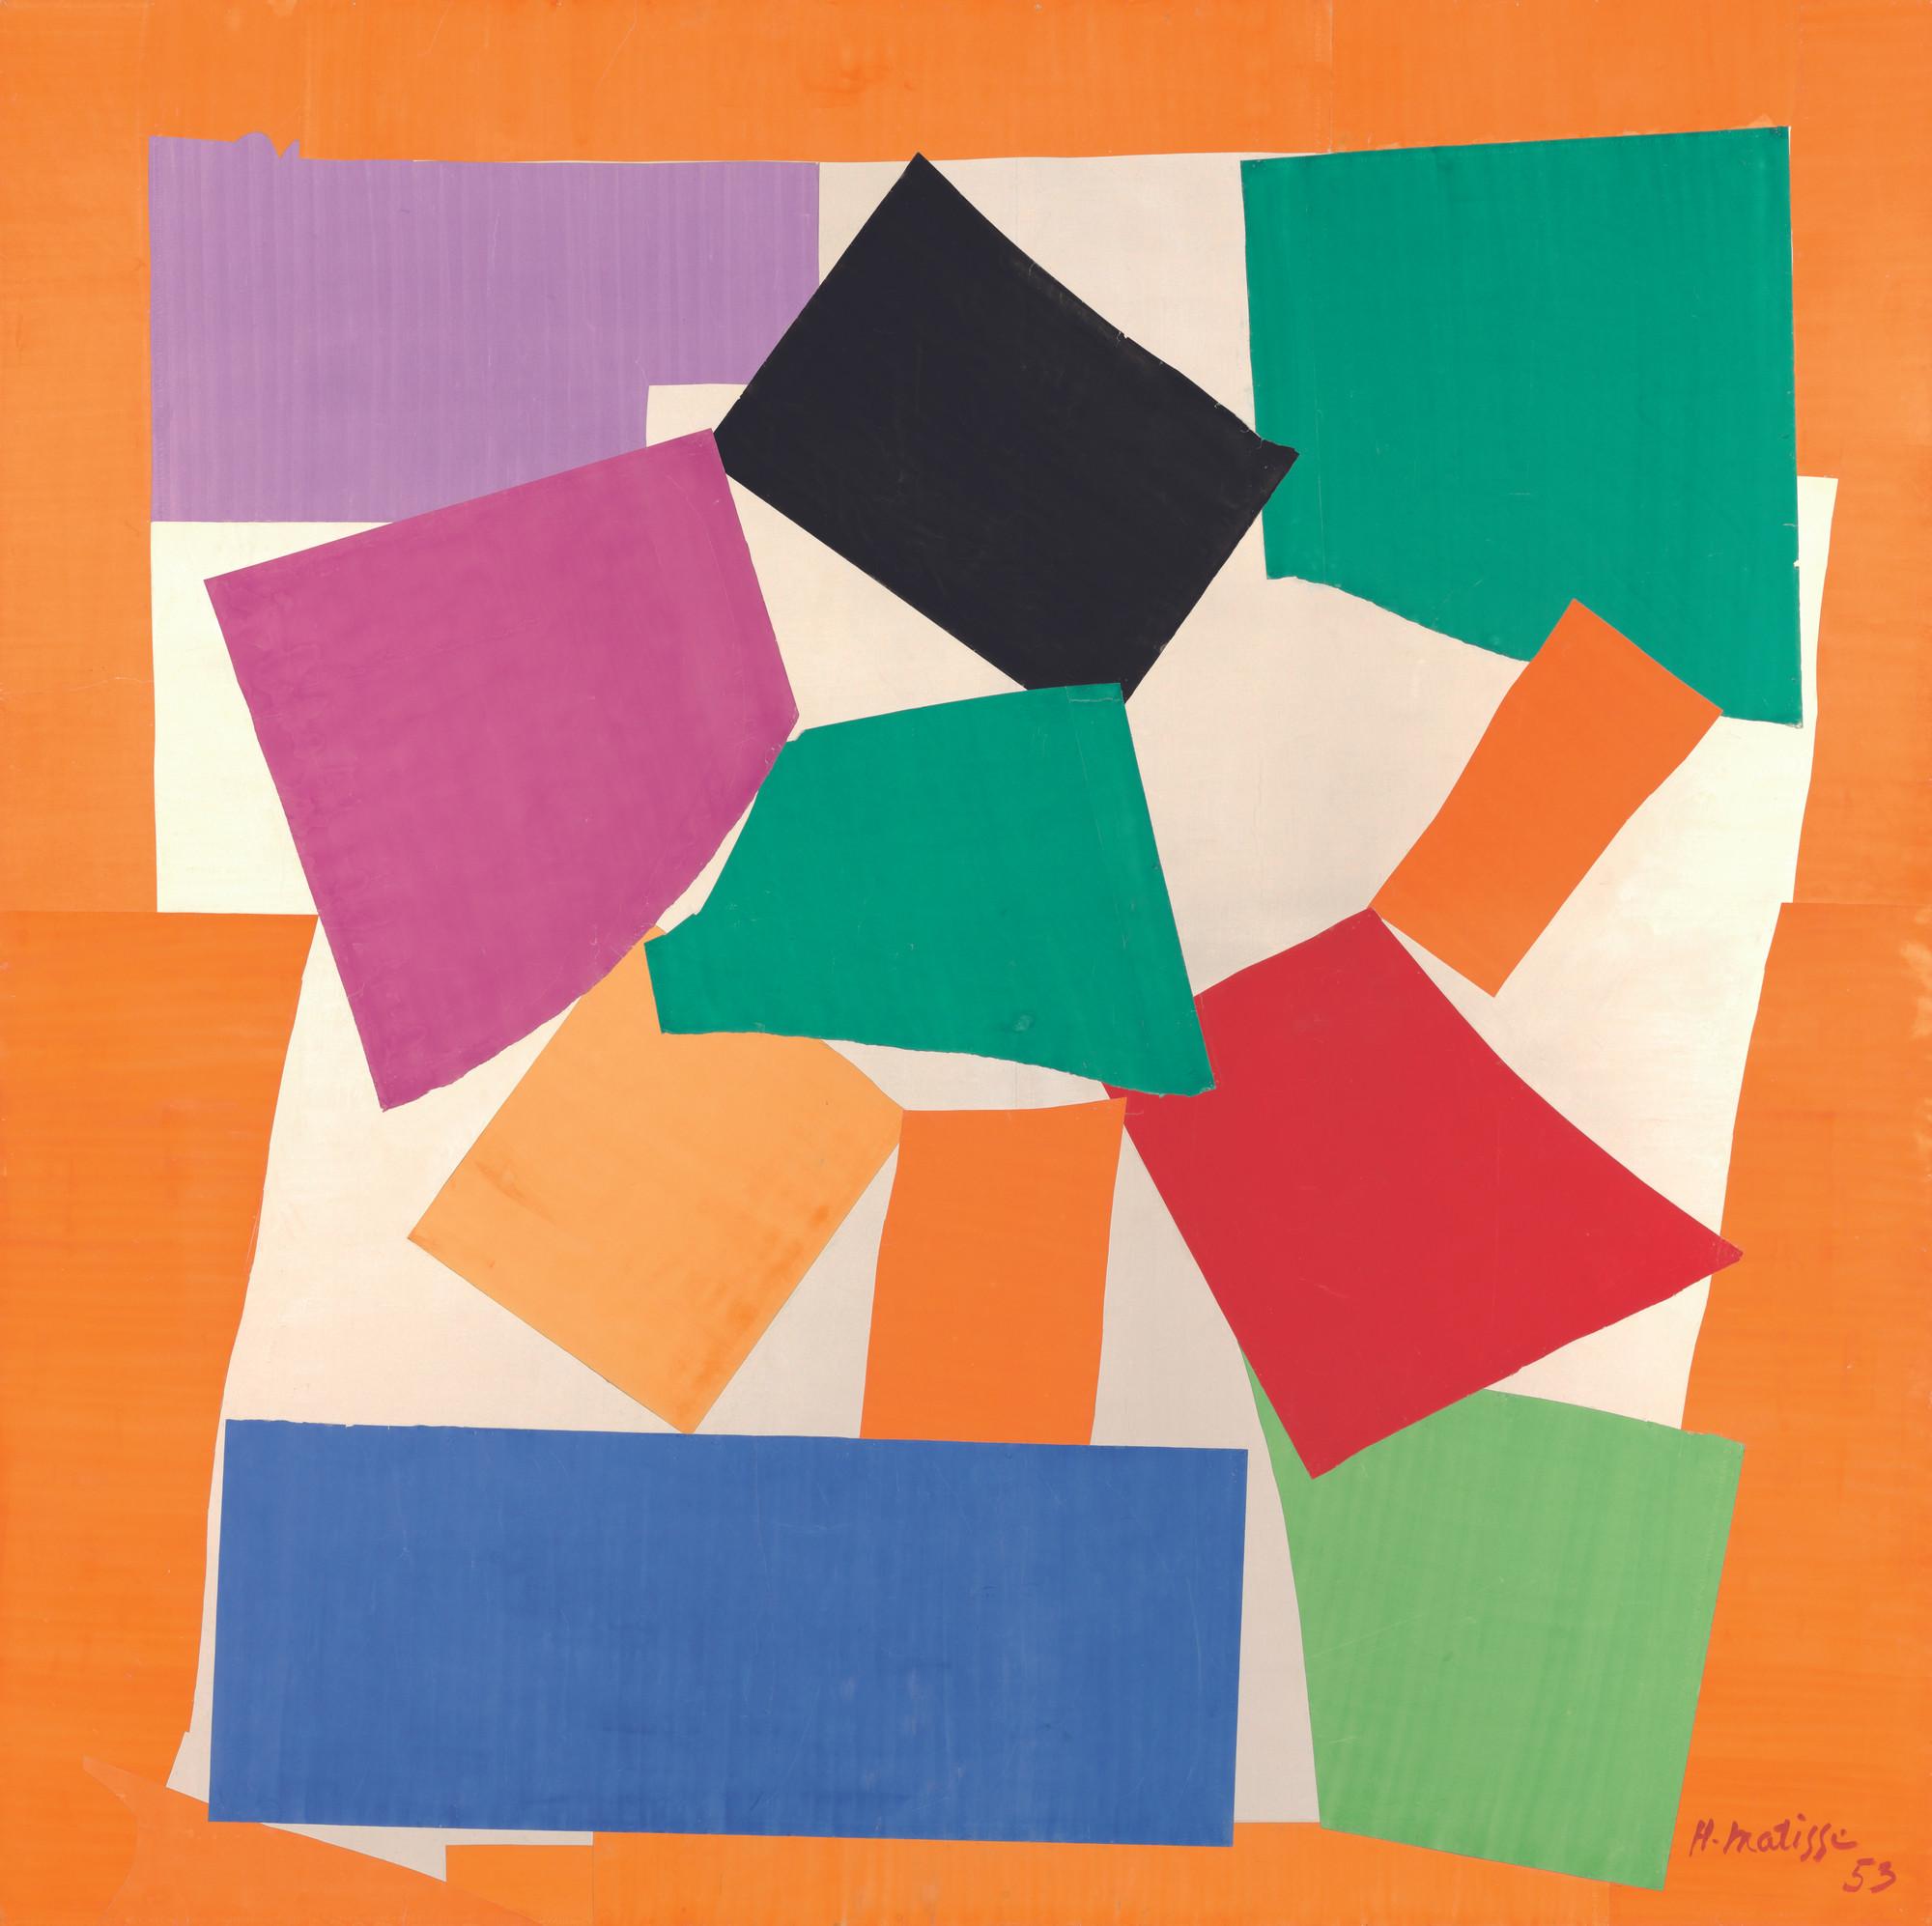 Henri Matisse. The Snail. 1953 | MoMA